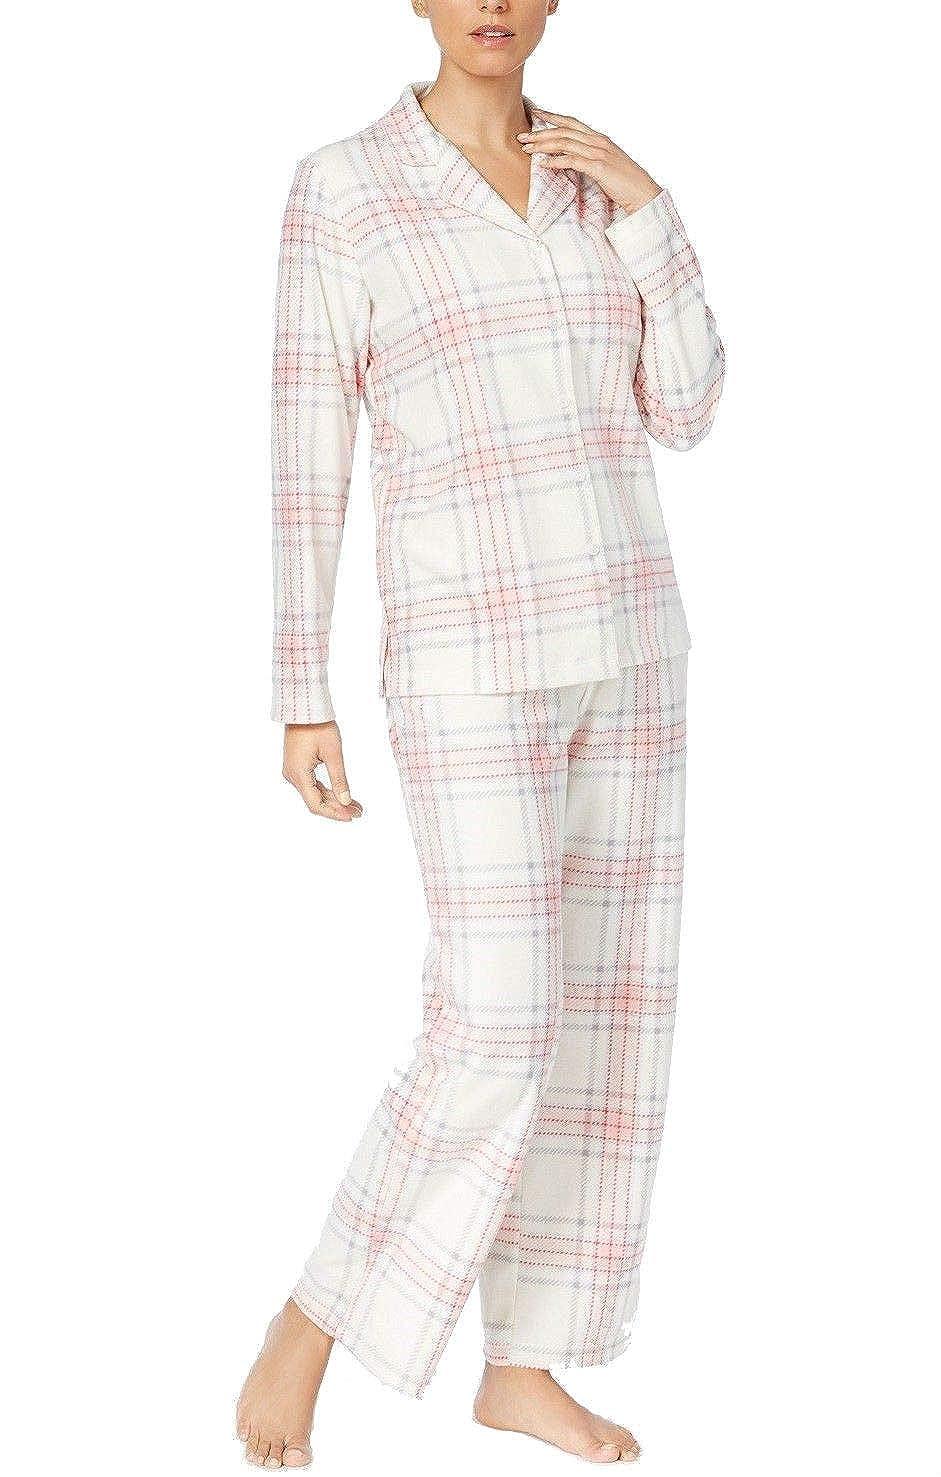 Black Large Striped Plaid Charter Club Printed Fleece Pajama Set Women's